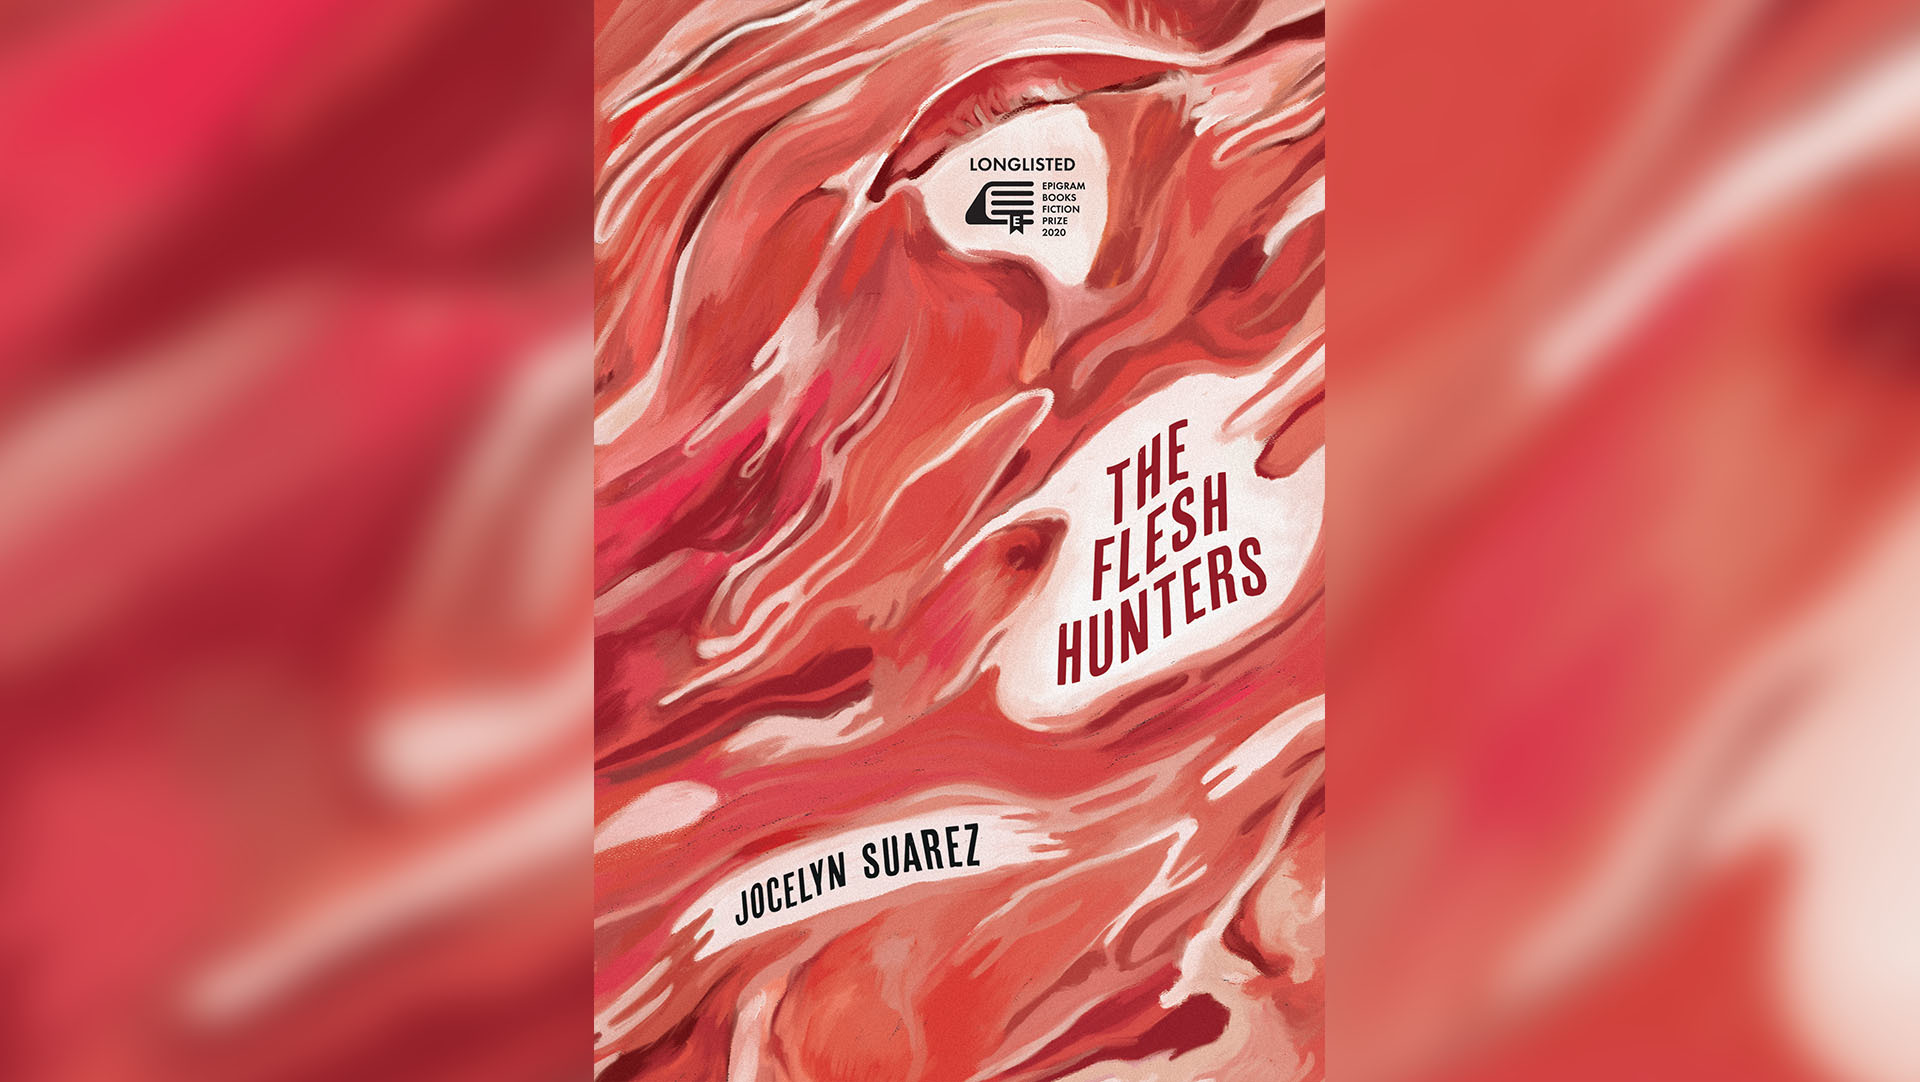 The Flesh Hunters